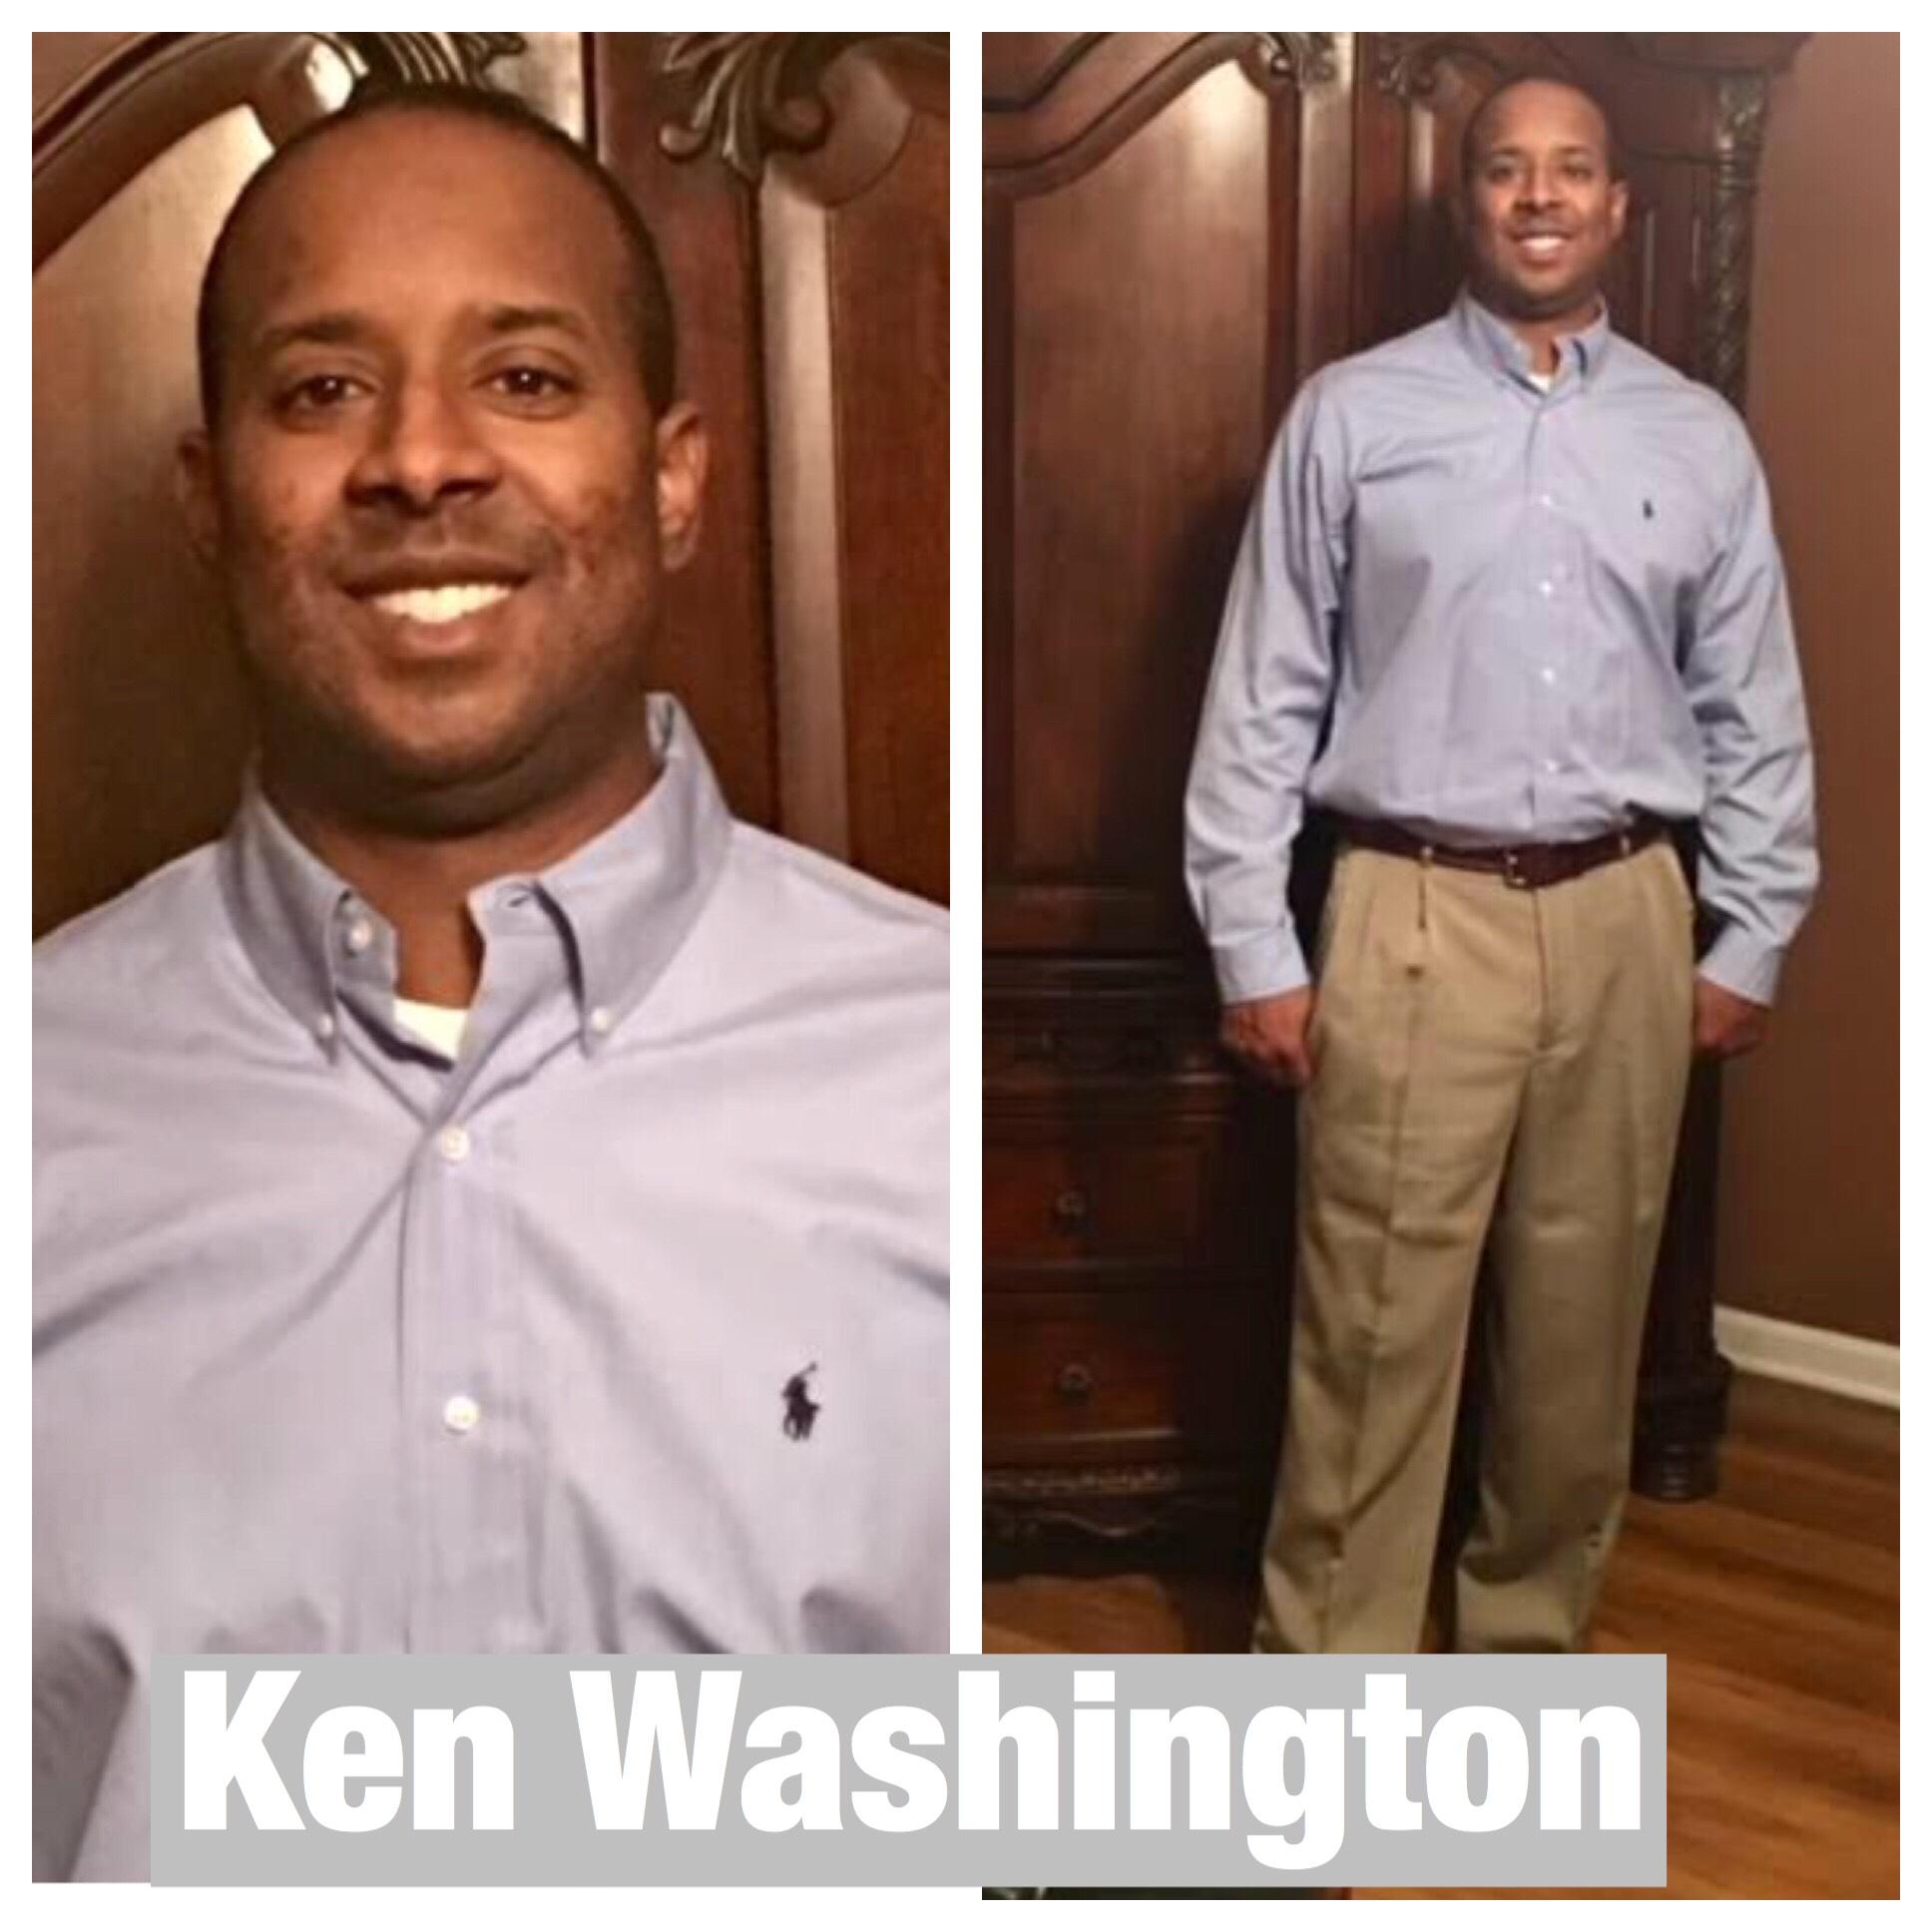 Ken Washington | DAN